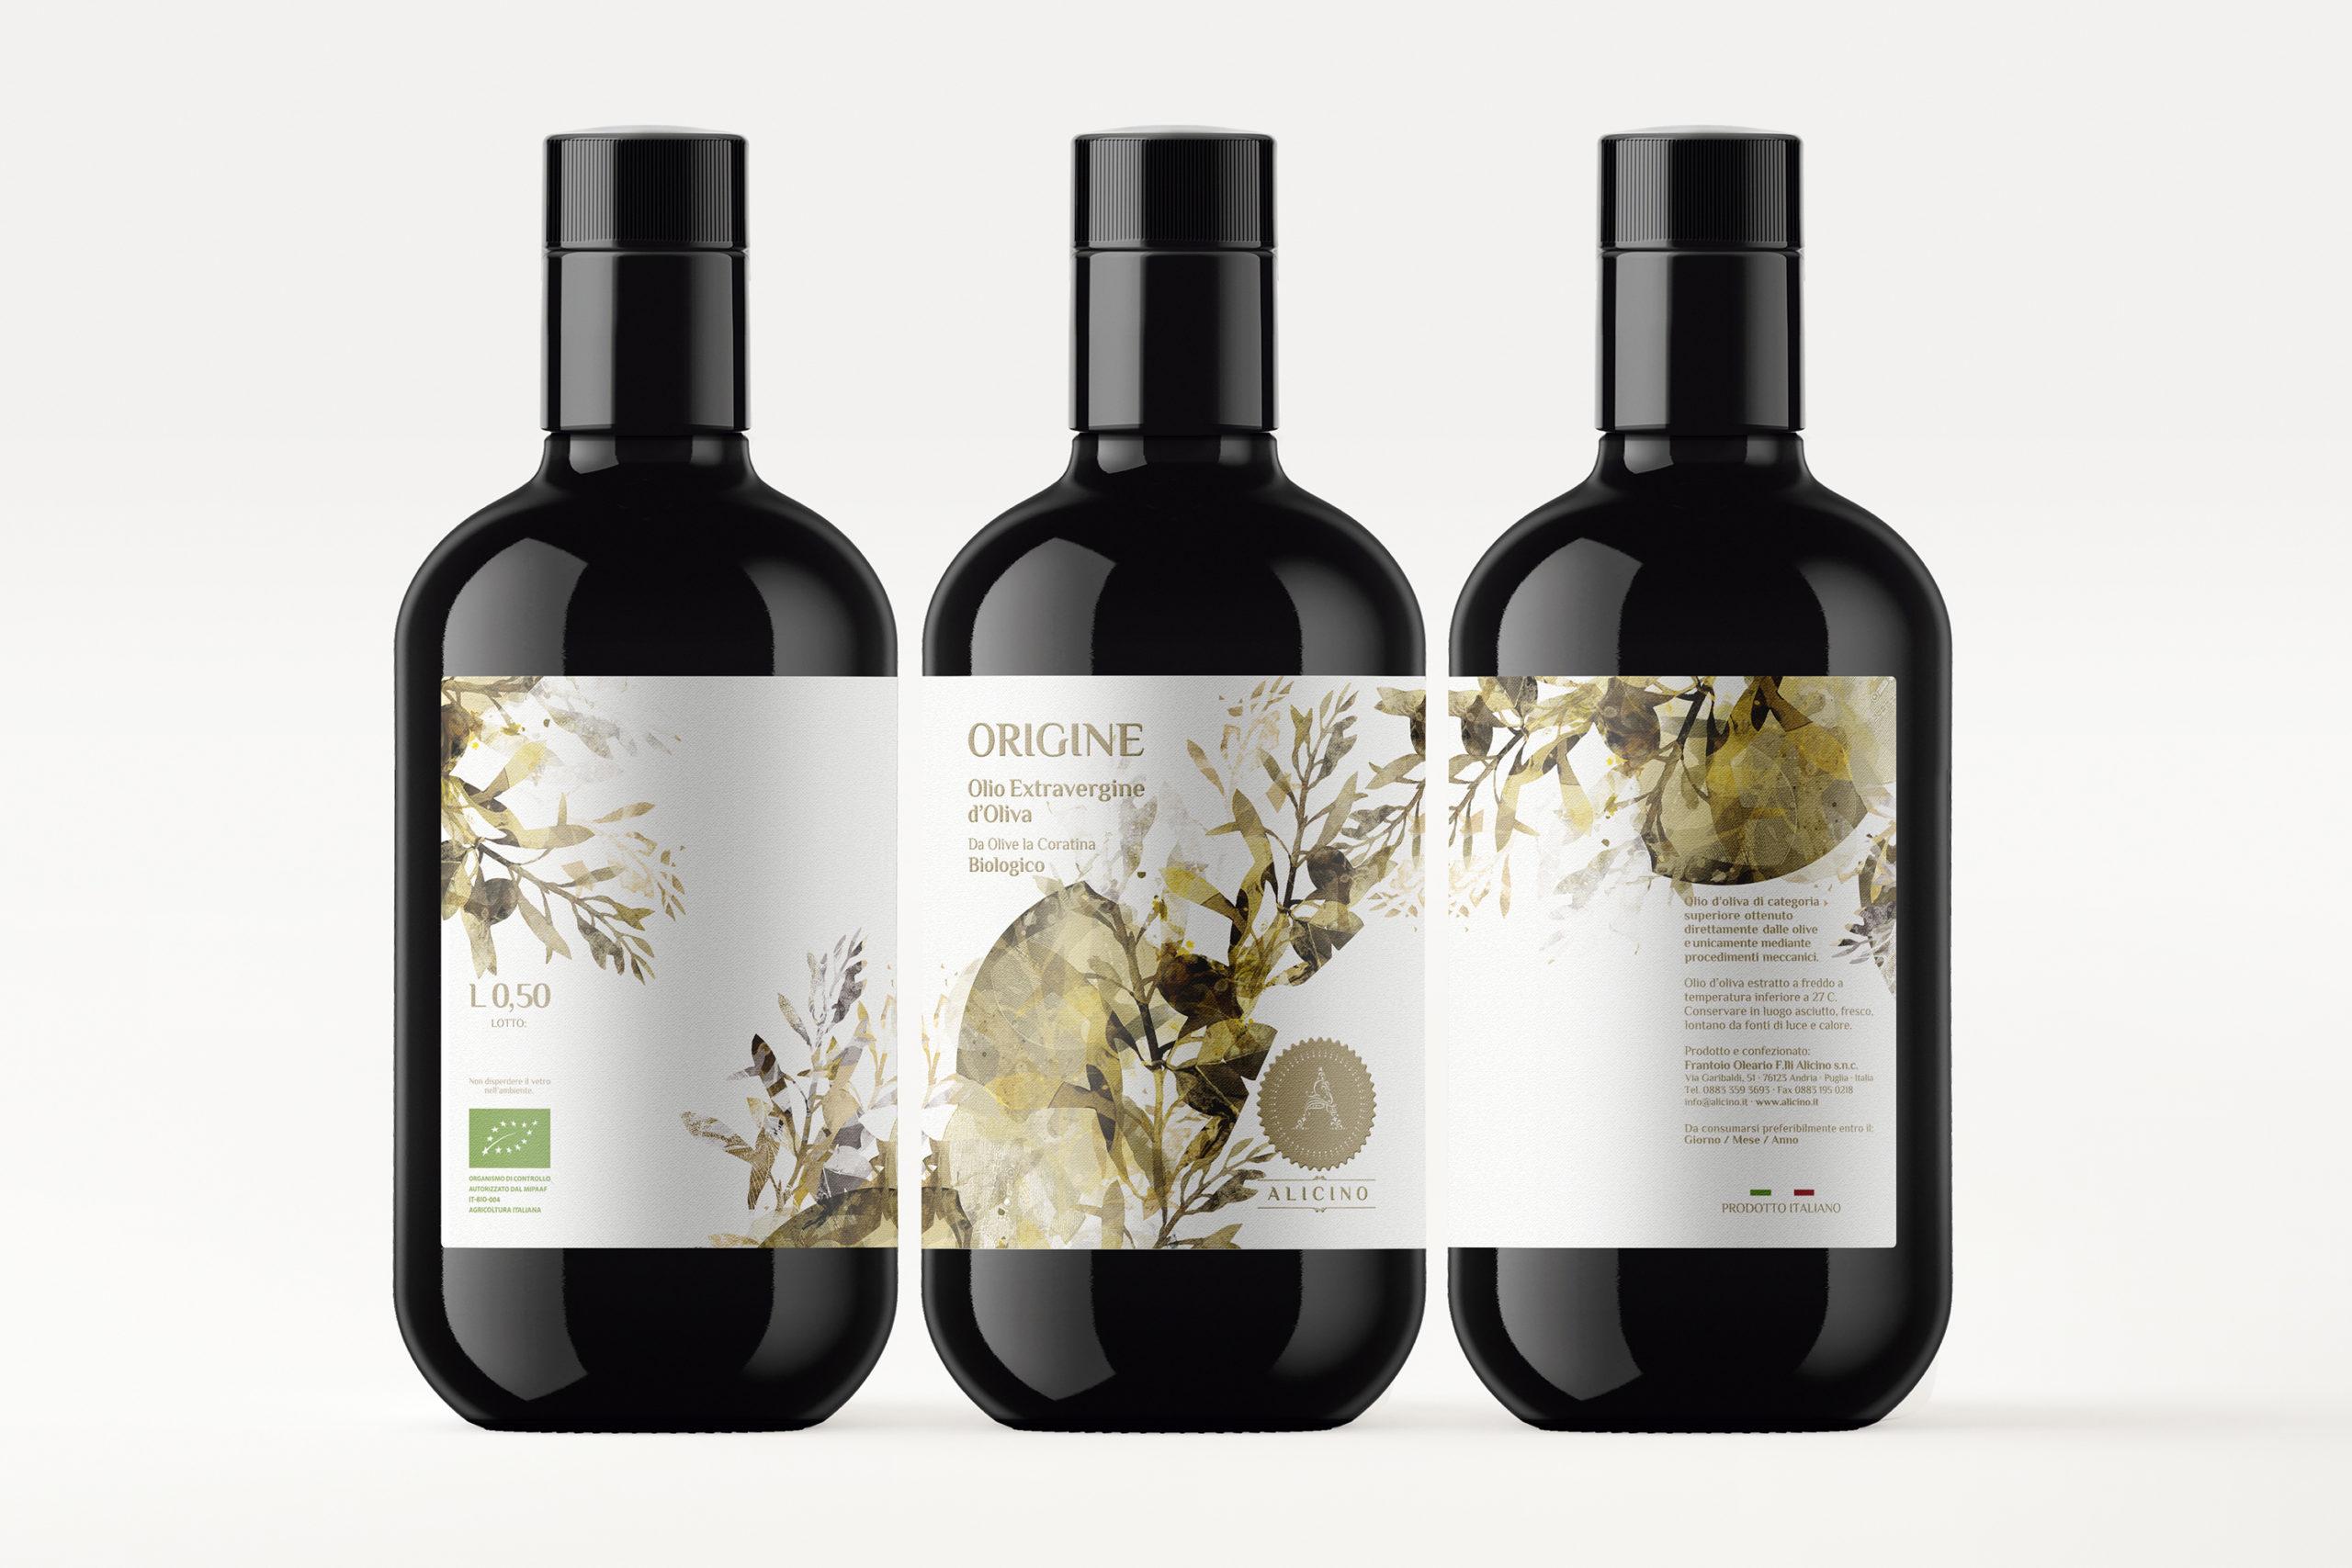 disegno etichetta olio extravergine di oliva puglia Armoder